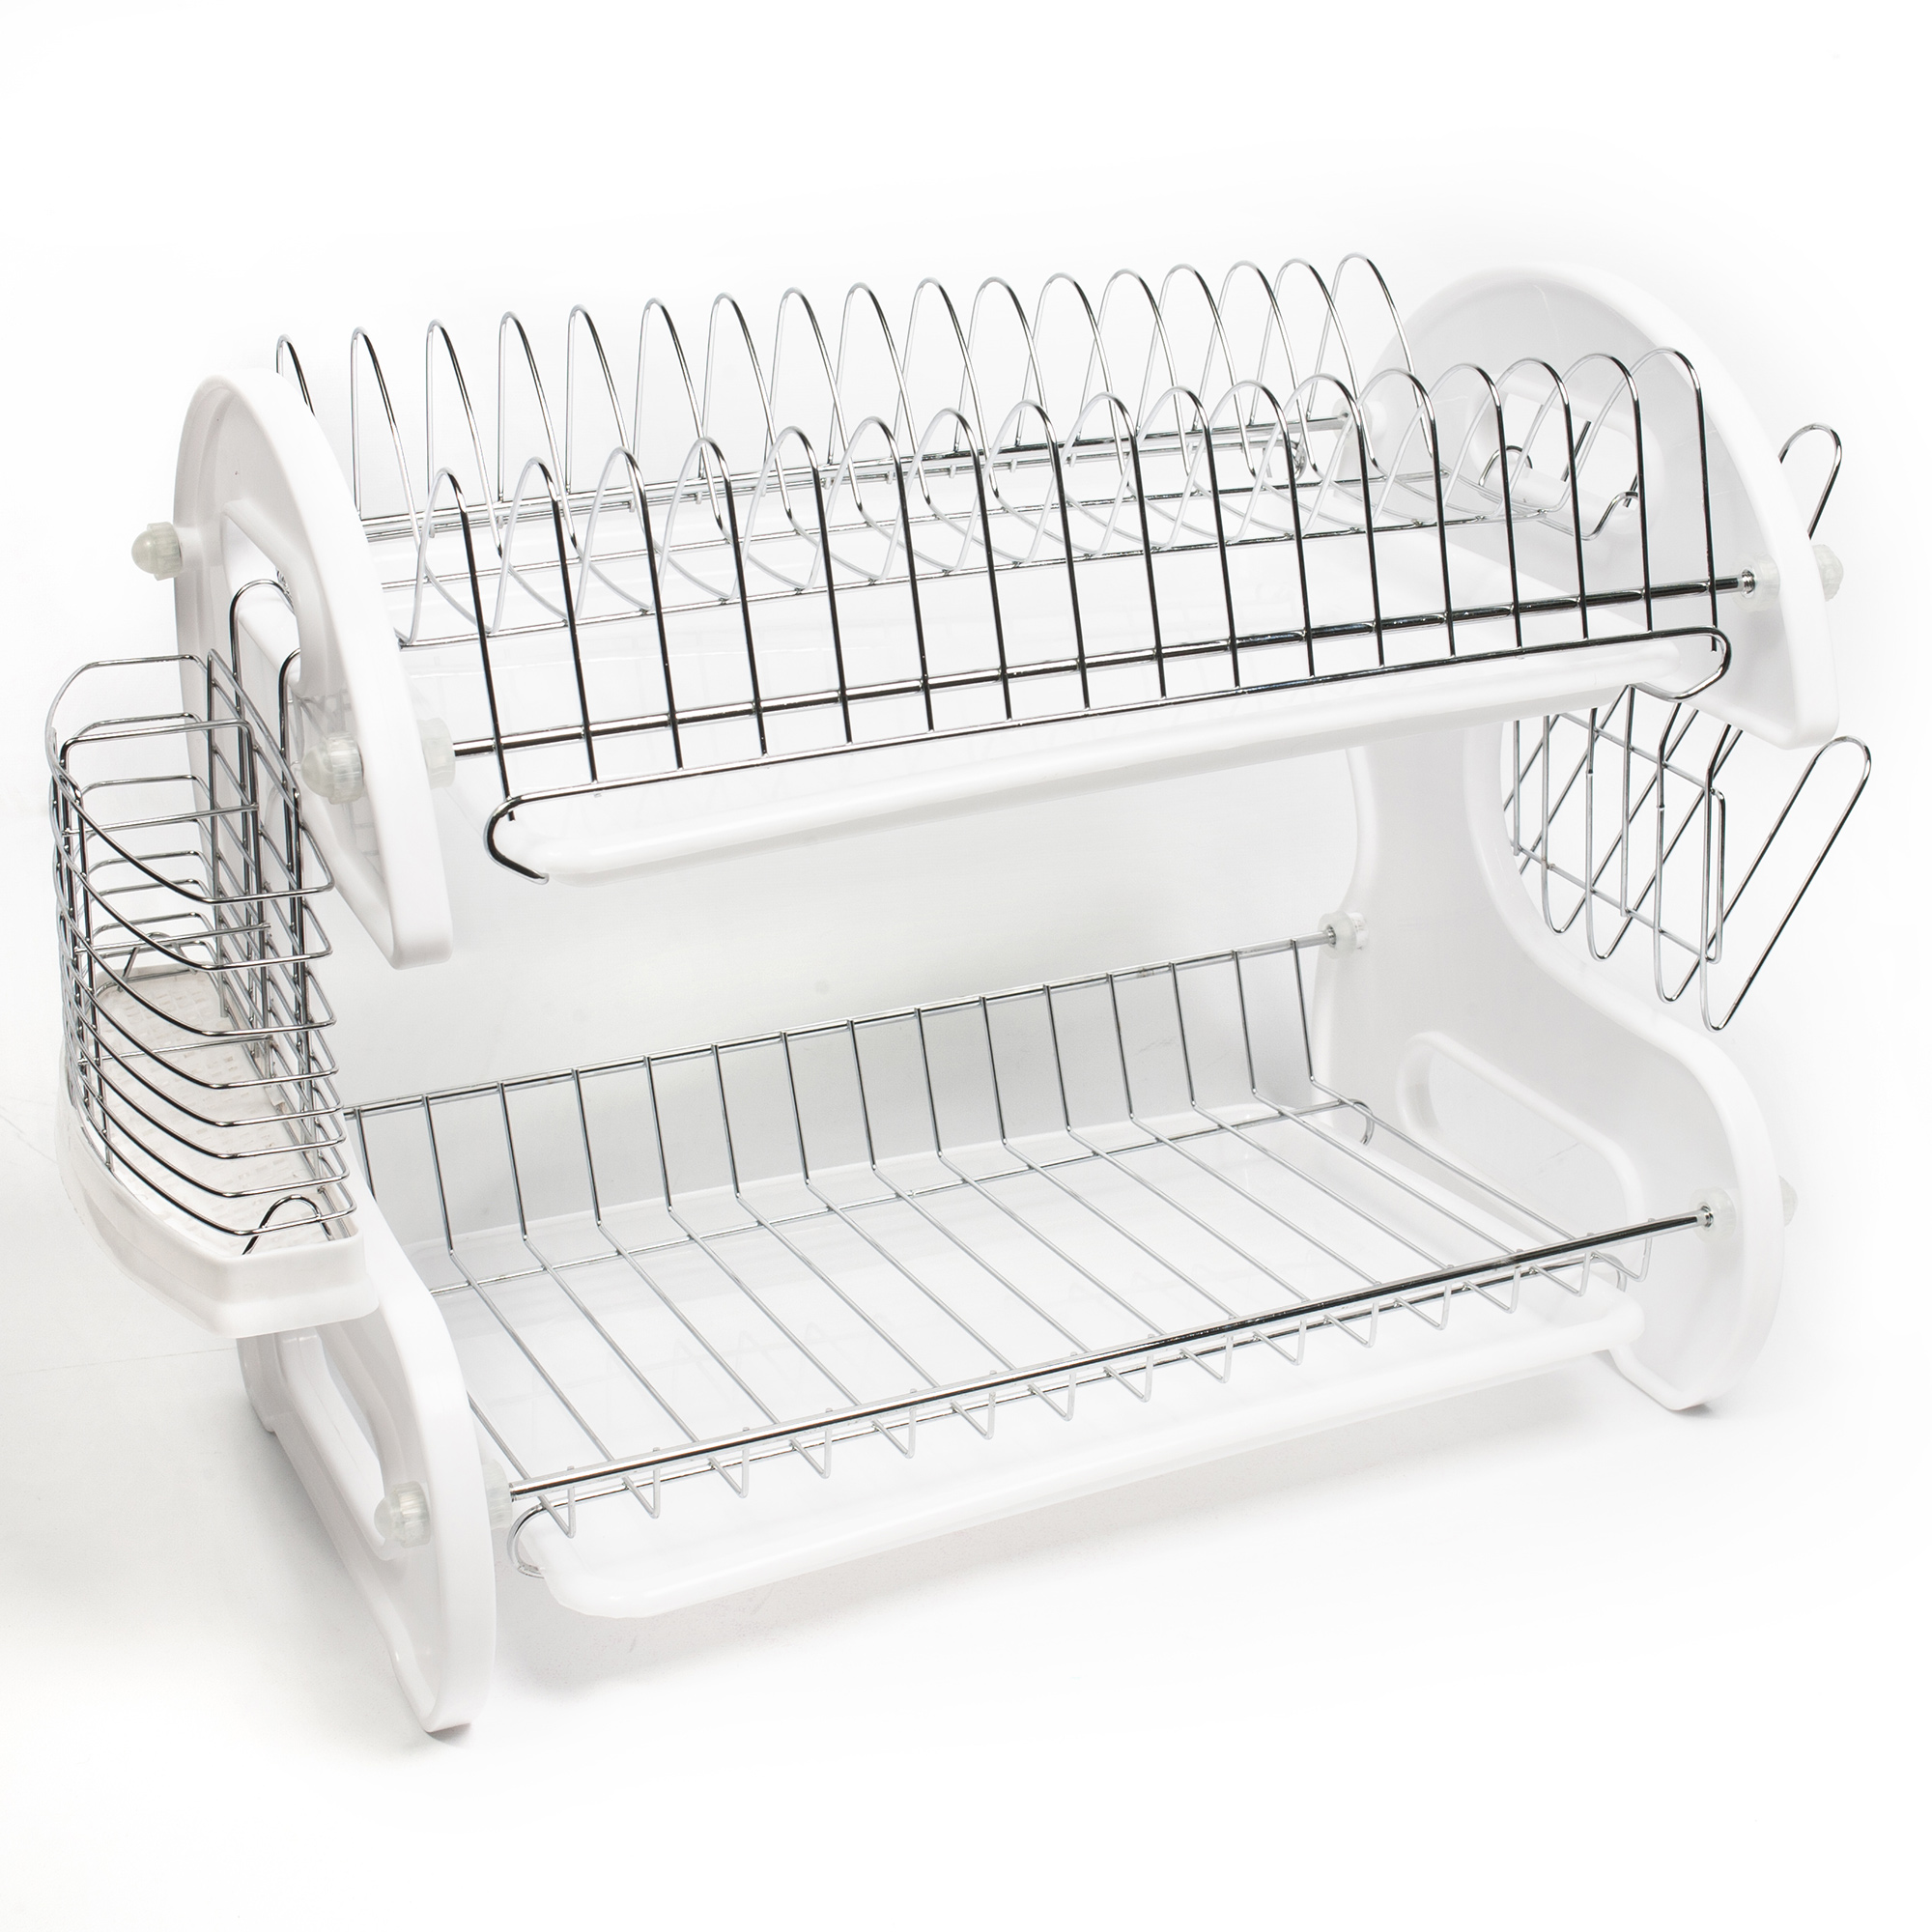 Details about home basics white 2 tier kitchen sink dish drainer set